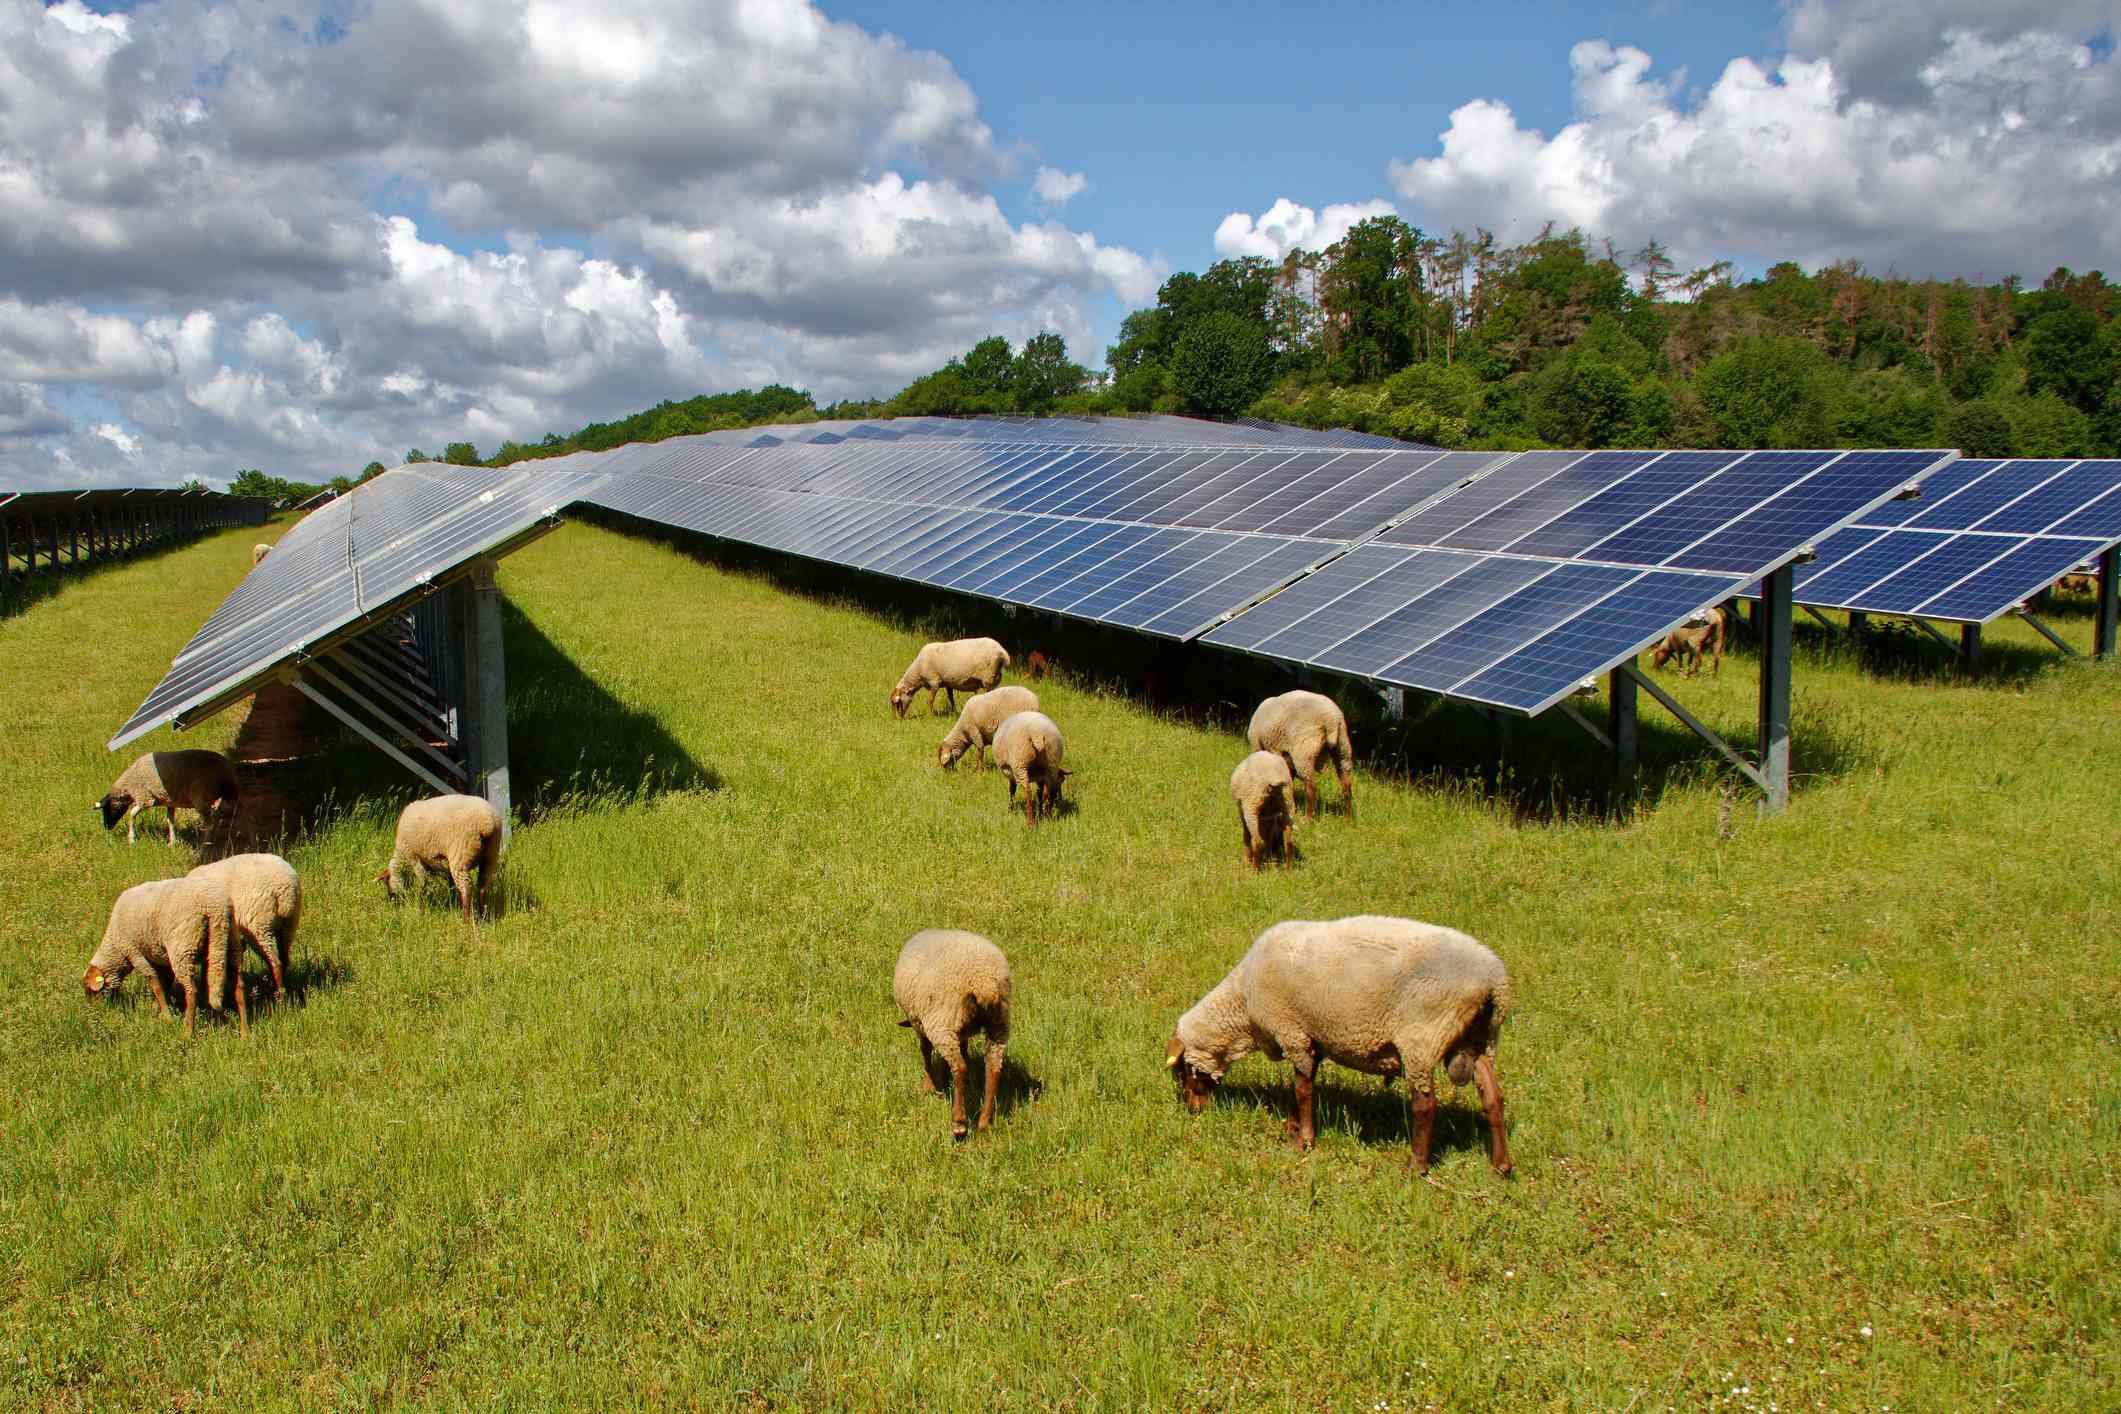 Sheep graze around and under a solar farm.